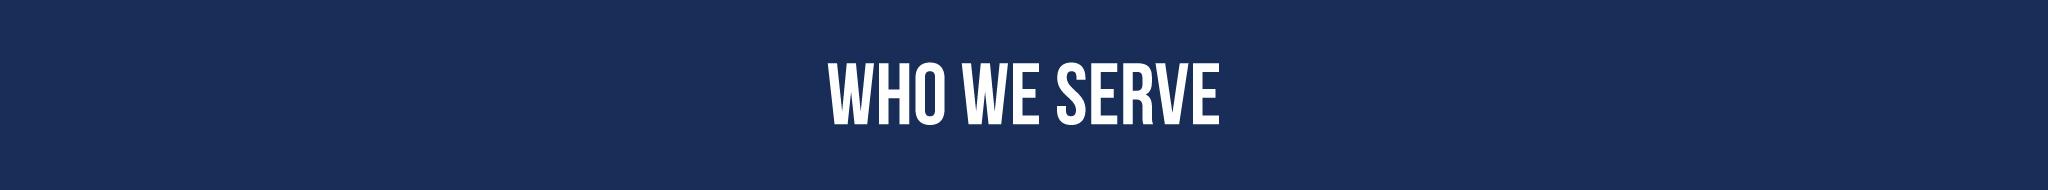 who-we-serve.jpg